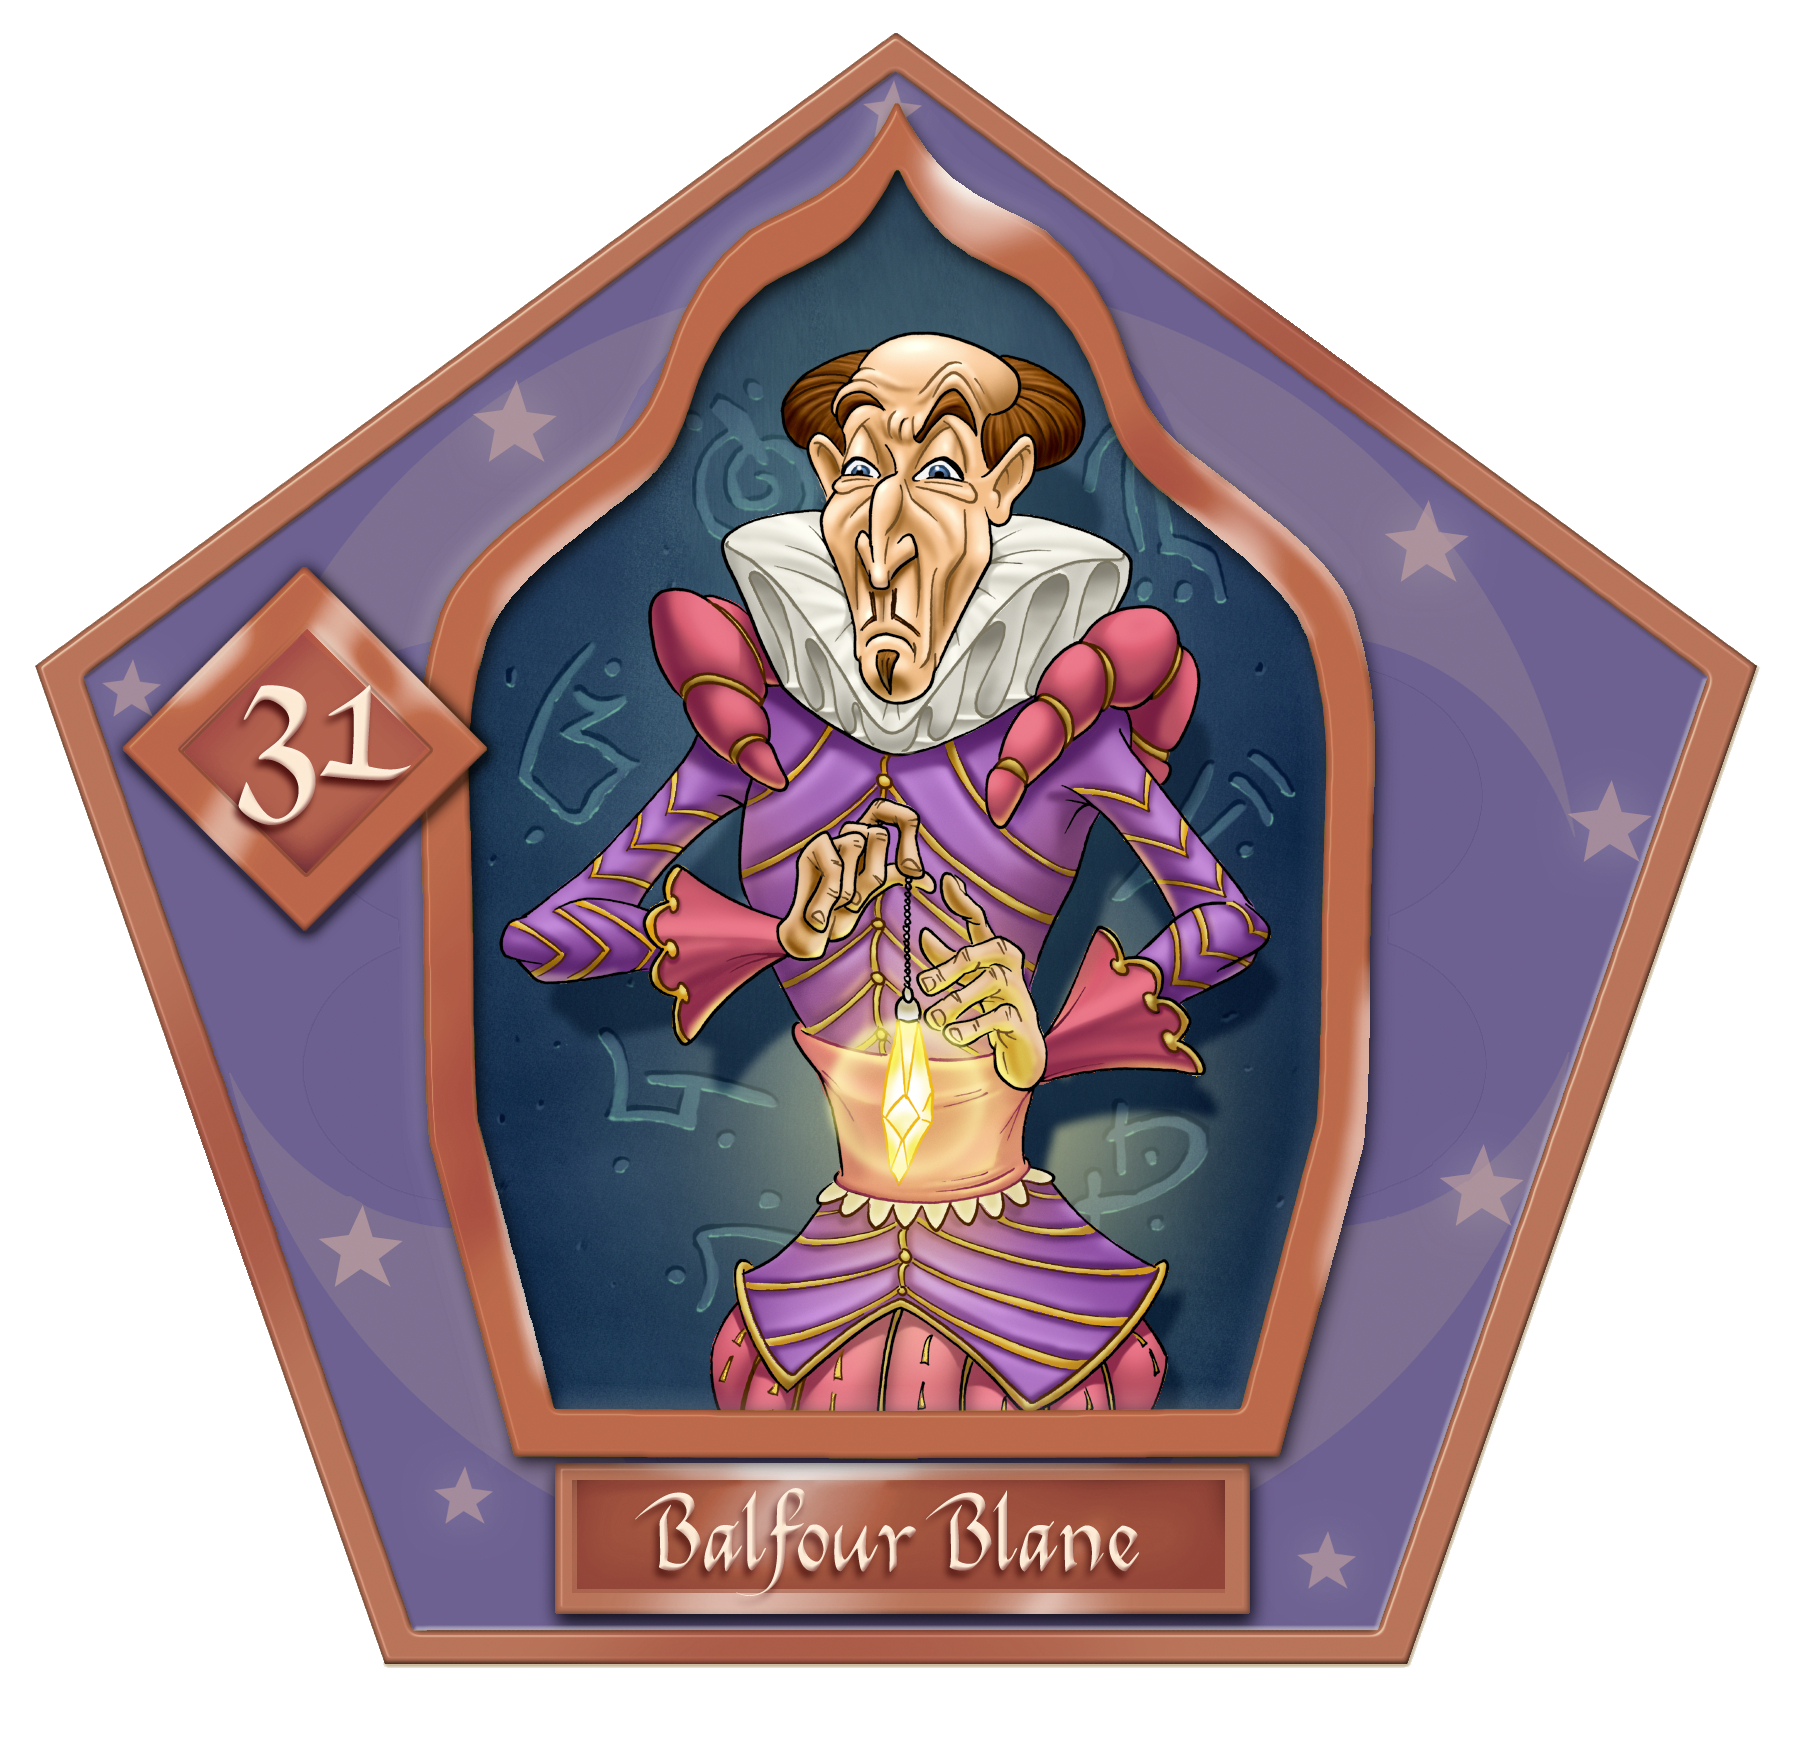 File:Balfour Blane-31-chocFrogCard.png